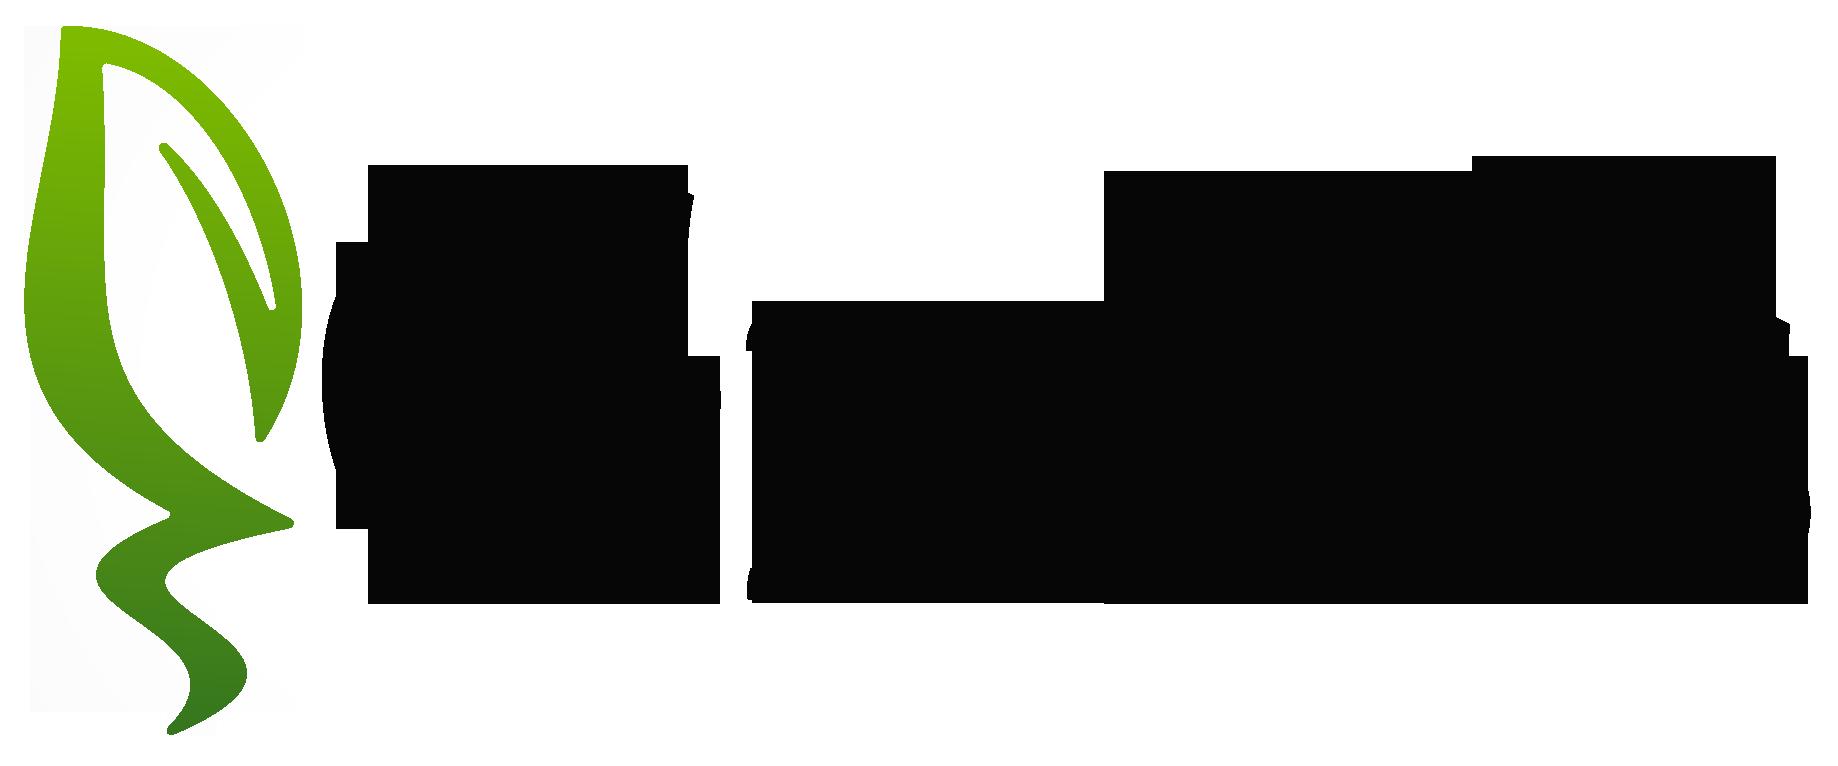 gratis open access publishersGratis #20